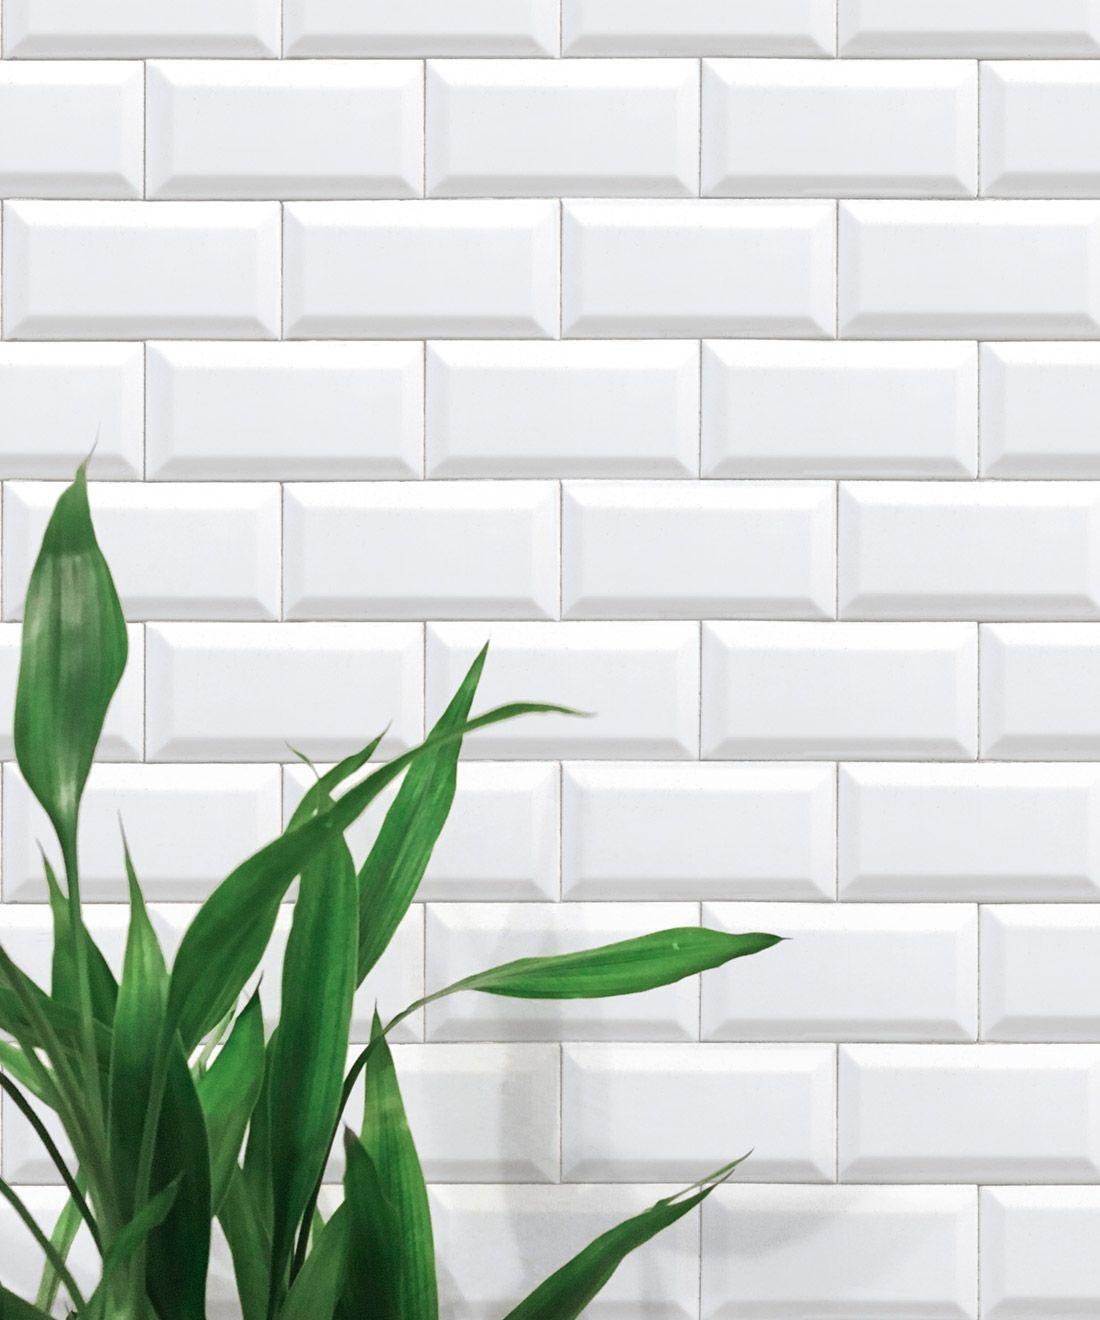 White Subway Tiles Wallpaper Minimal Wallpaper Milton King White Subway Tiles Tile Wallpaper Bathroom Wallpaper Trends